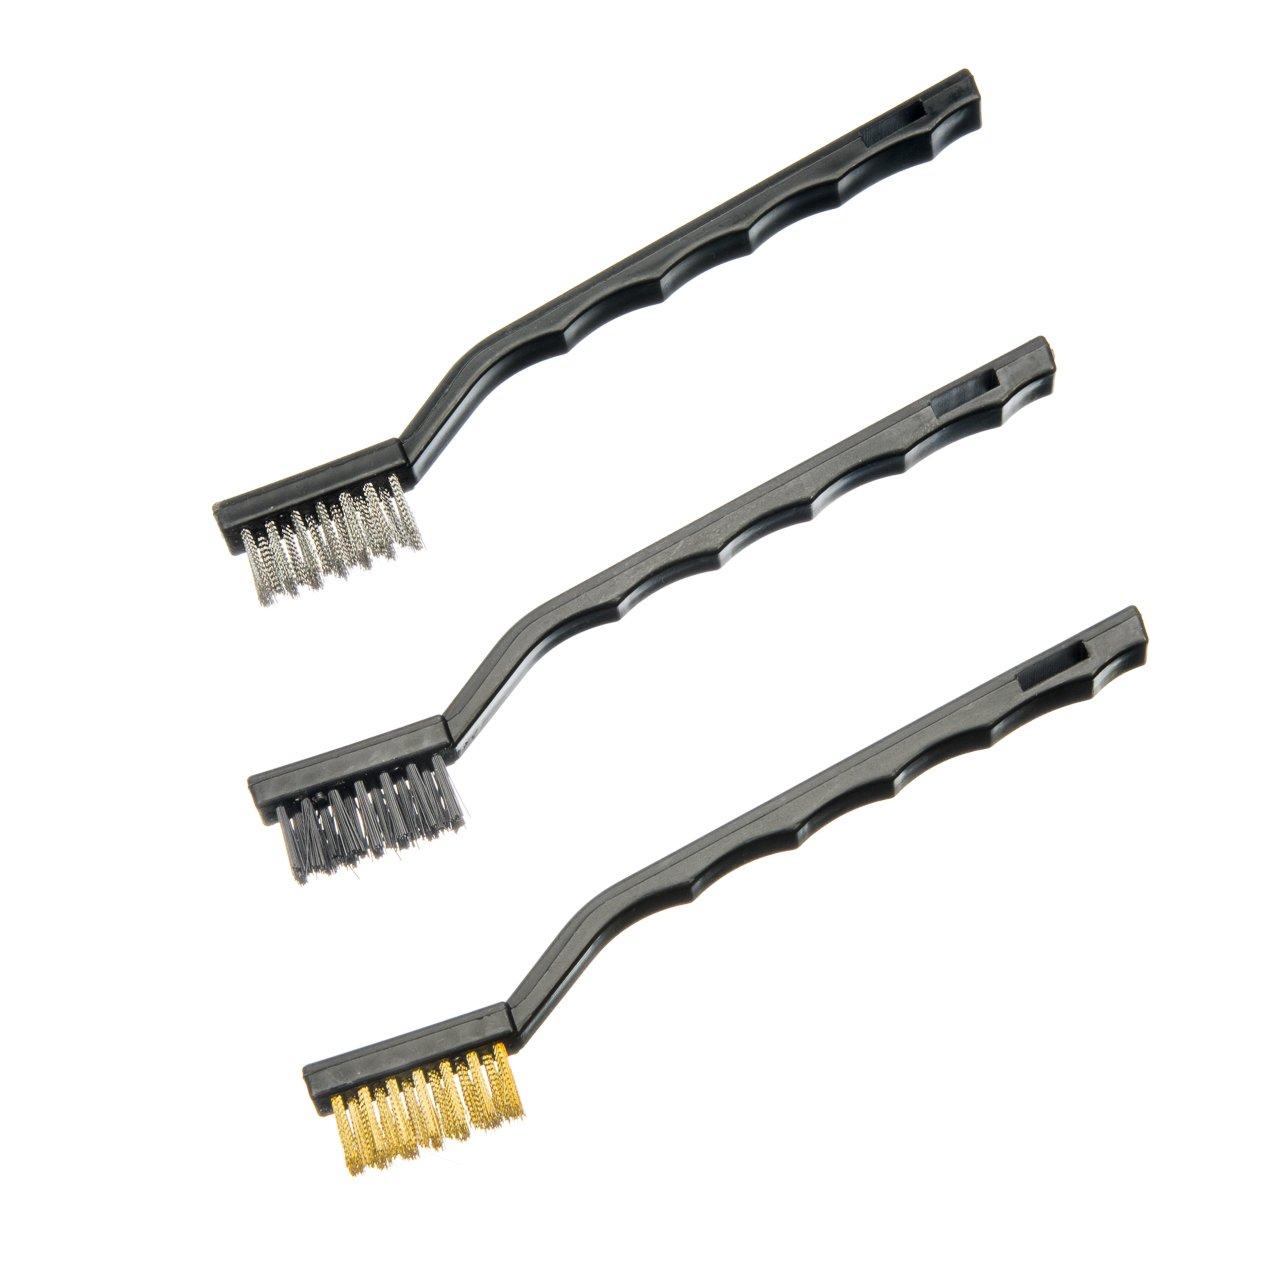 SE 772WBP 3-Piece Mini Wire Brush Set, Plastic Handle, Brass, Nylon, Stainless Steel